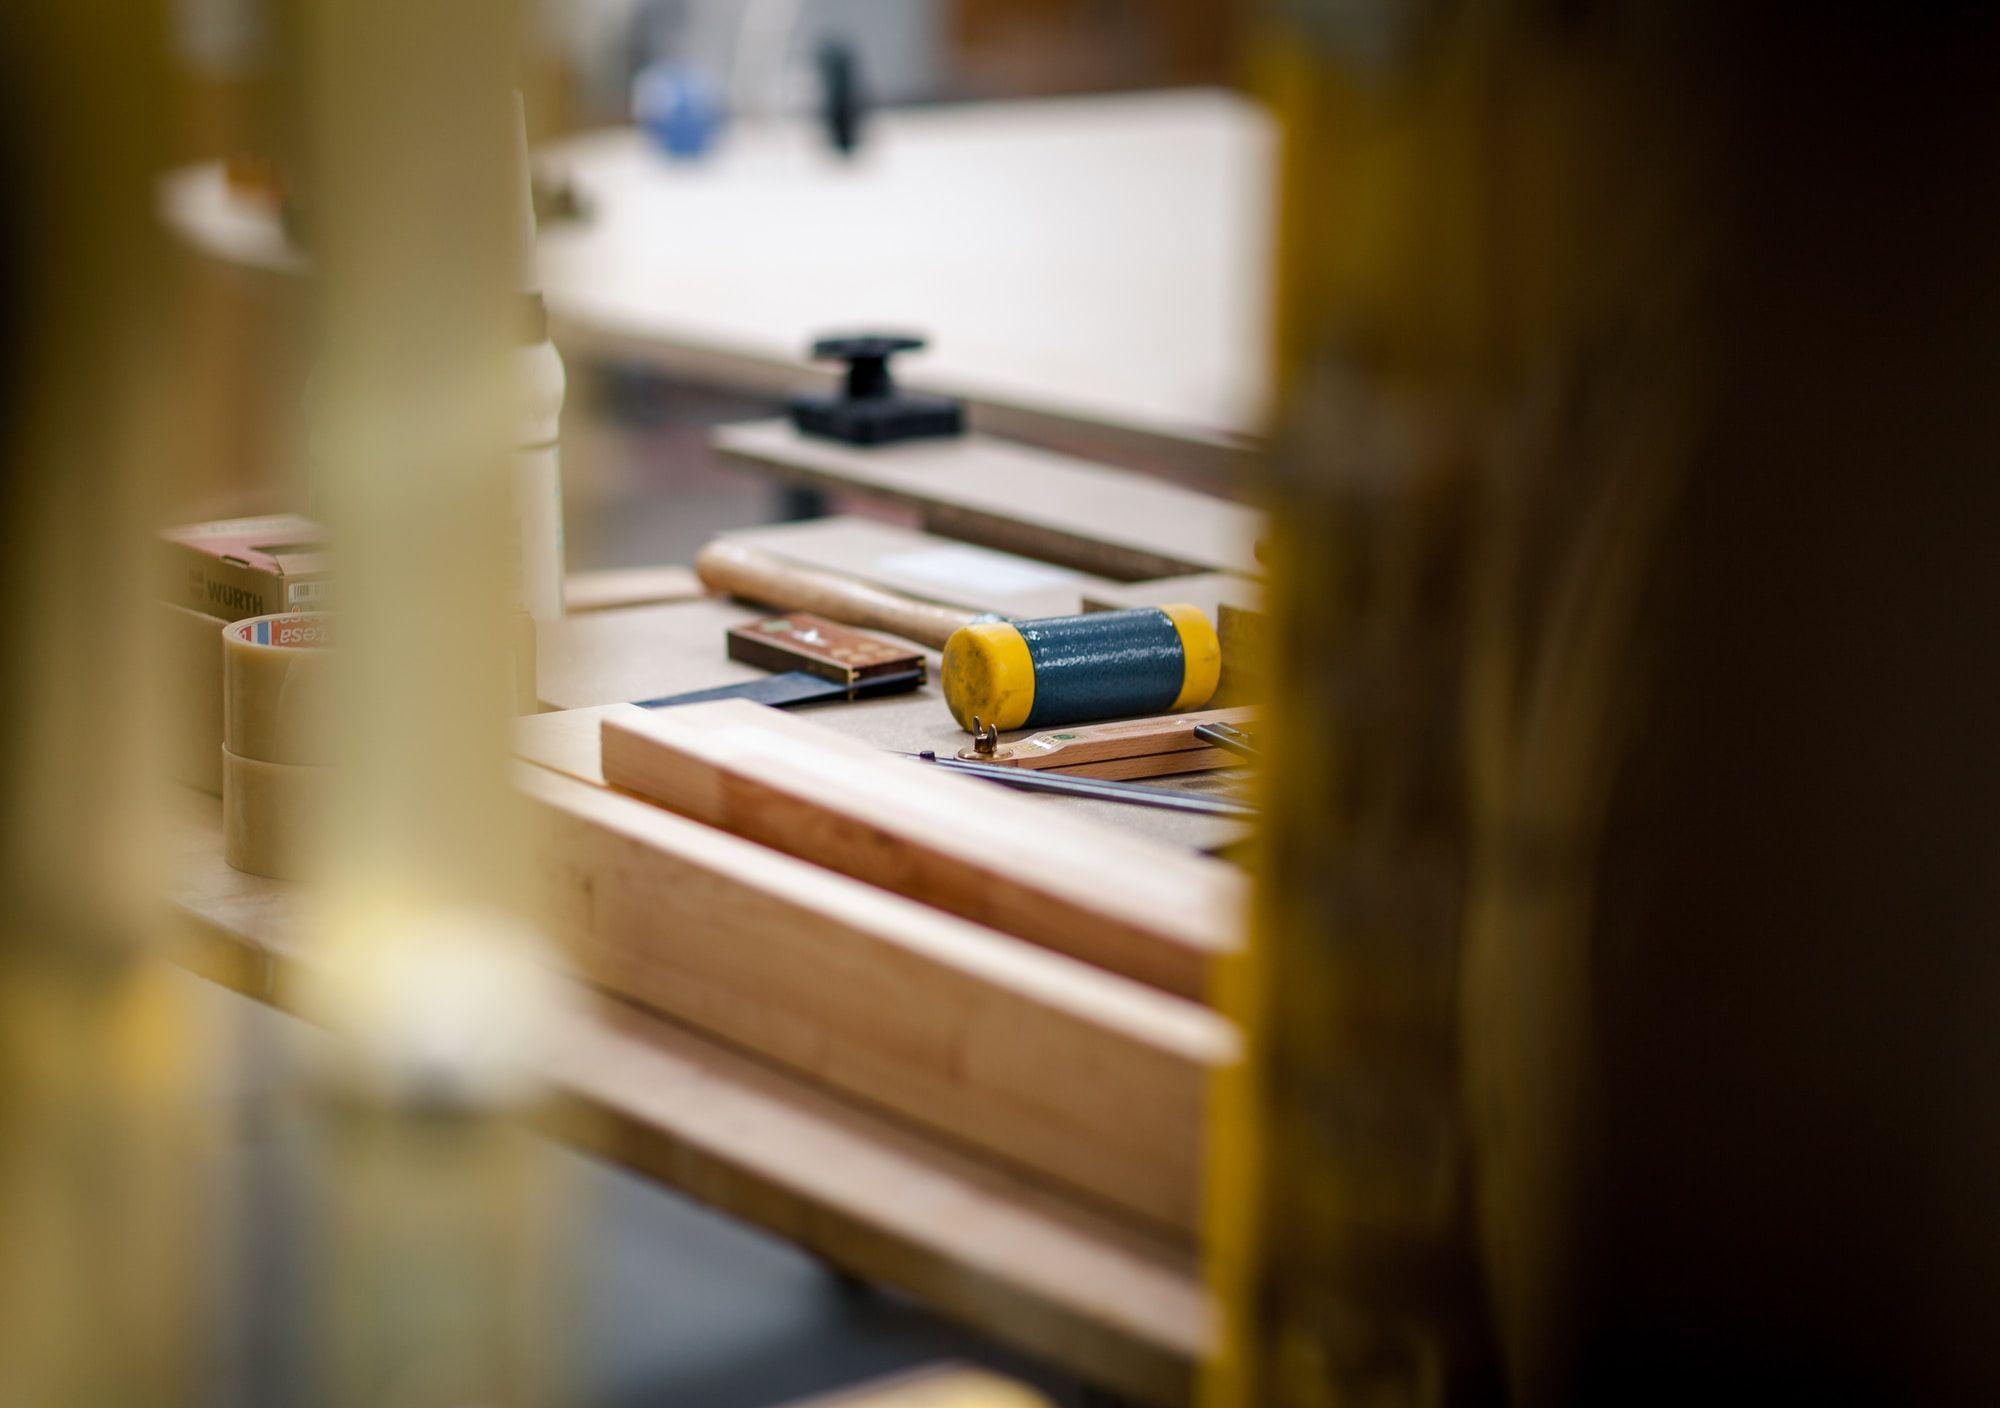 Complete Renovation Service in Mandurah and Peel